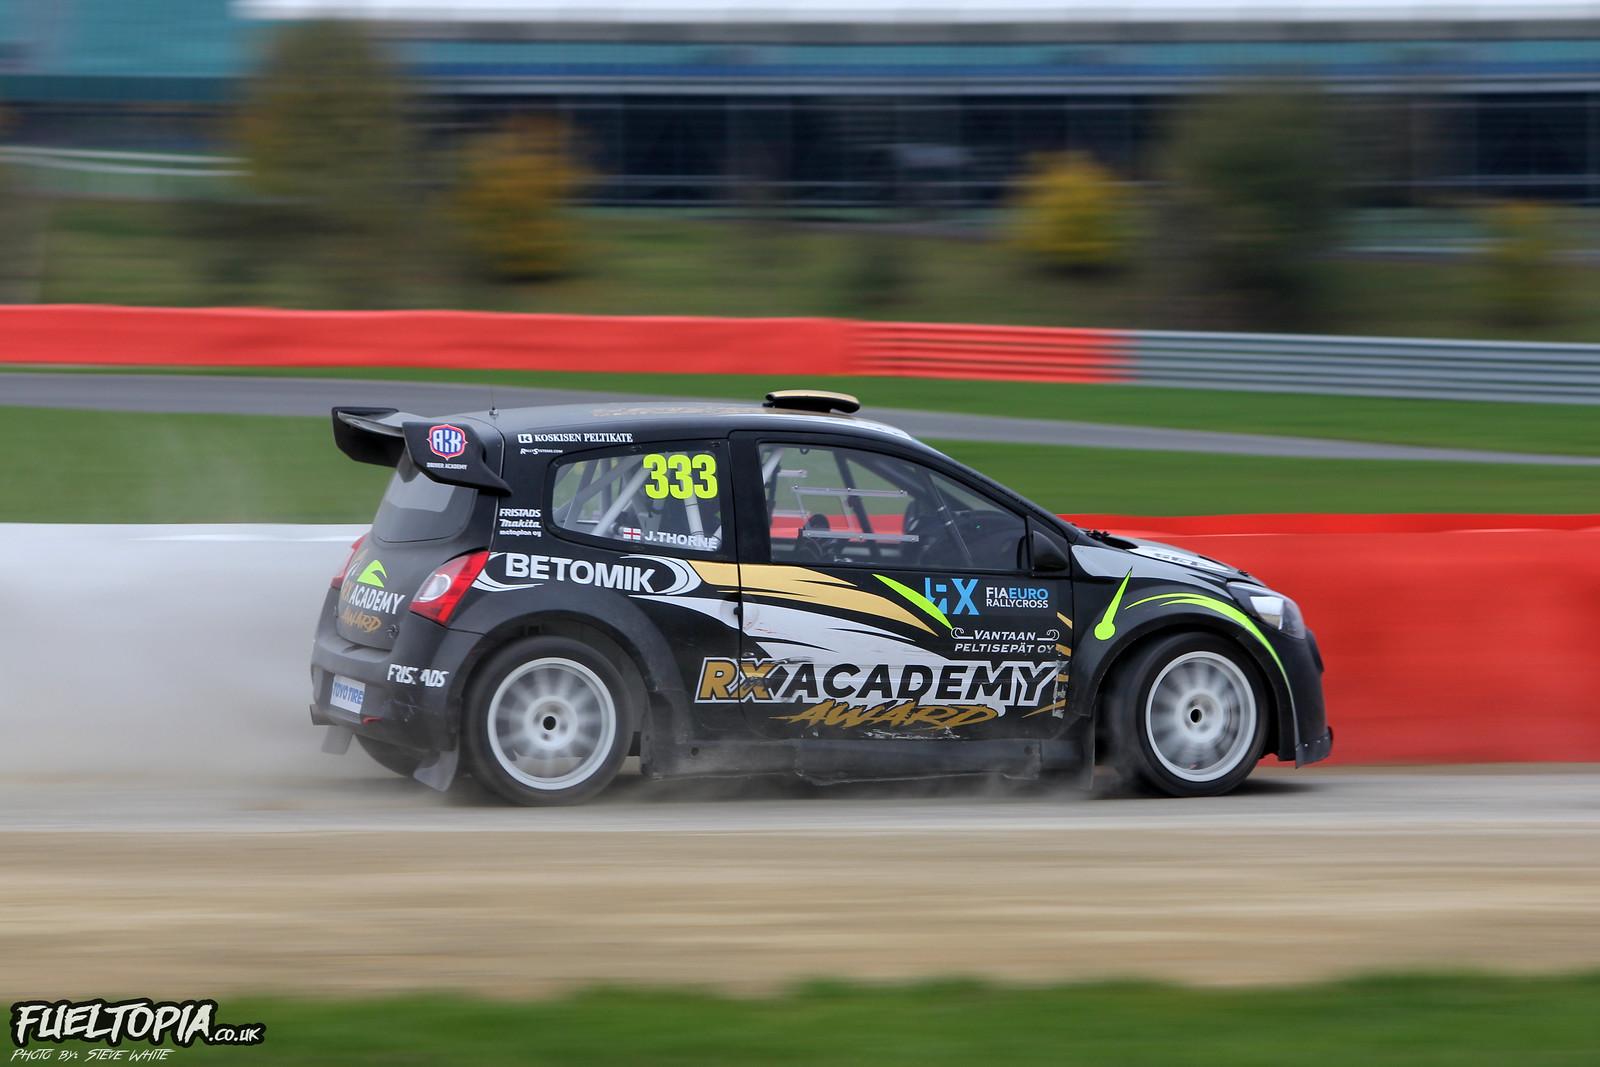 Jack Thorne Renault Twingo Silverstone BRX British Rallycross Championship 2018 Steve White Fueltopia